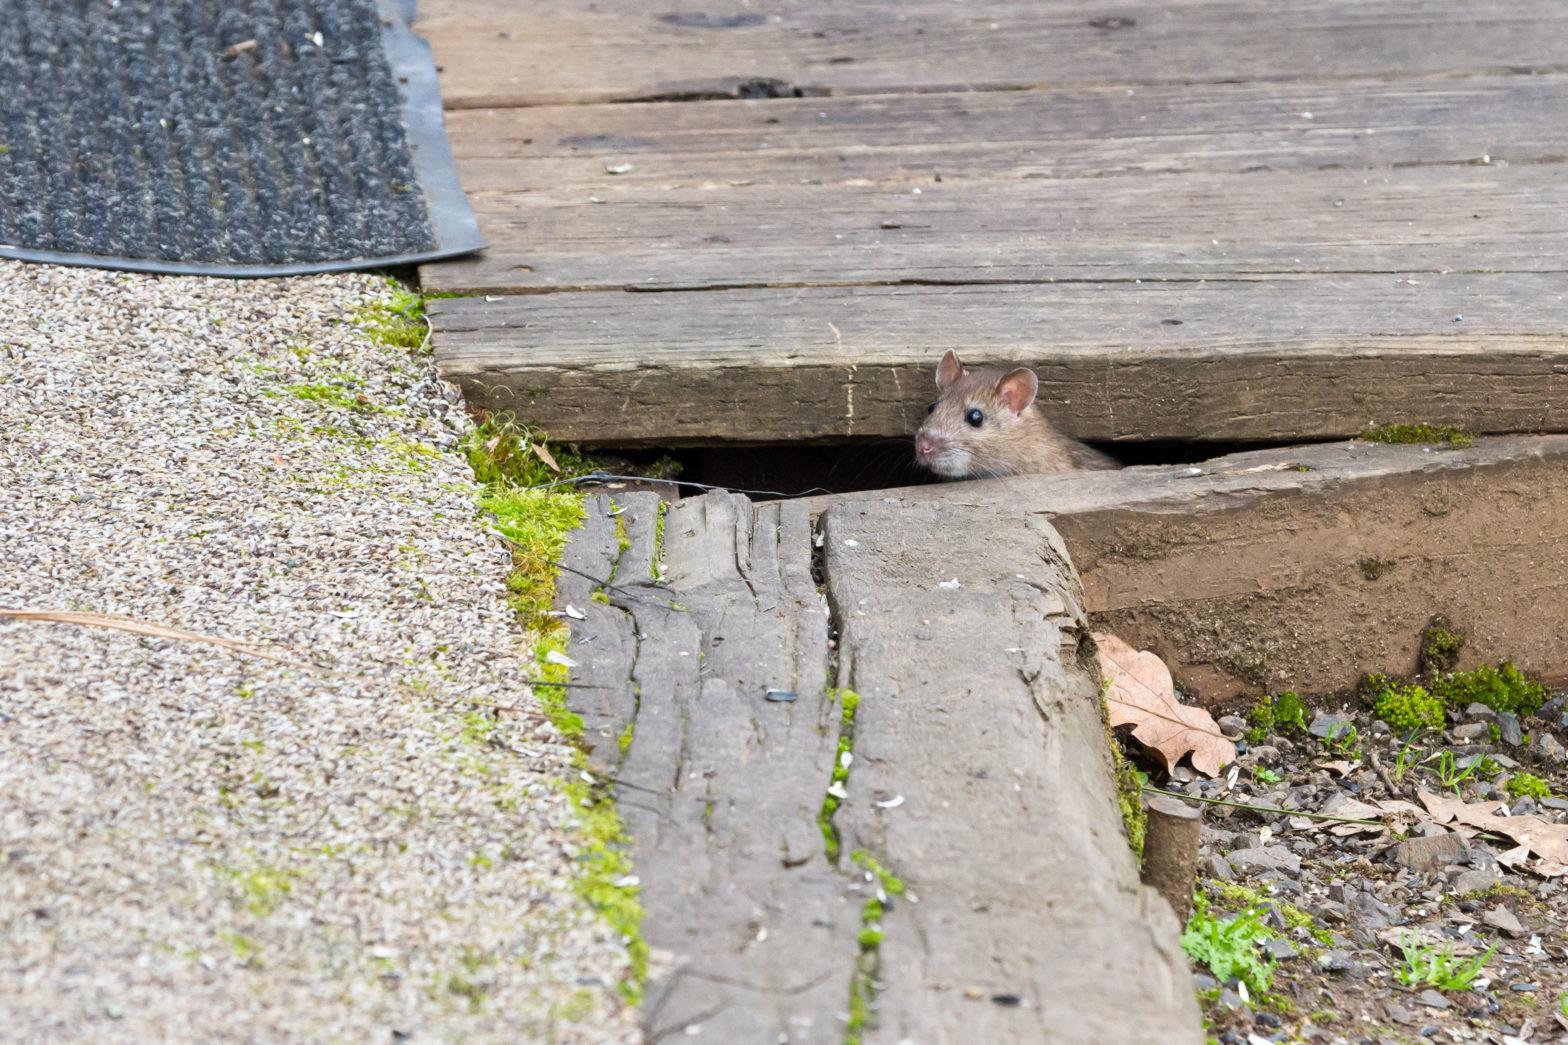 rats living under decking